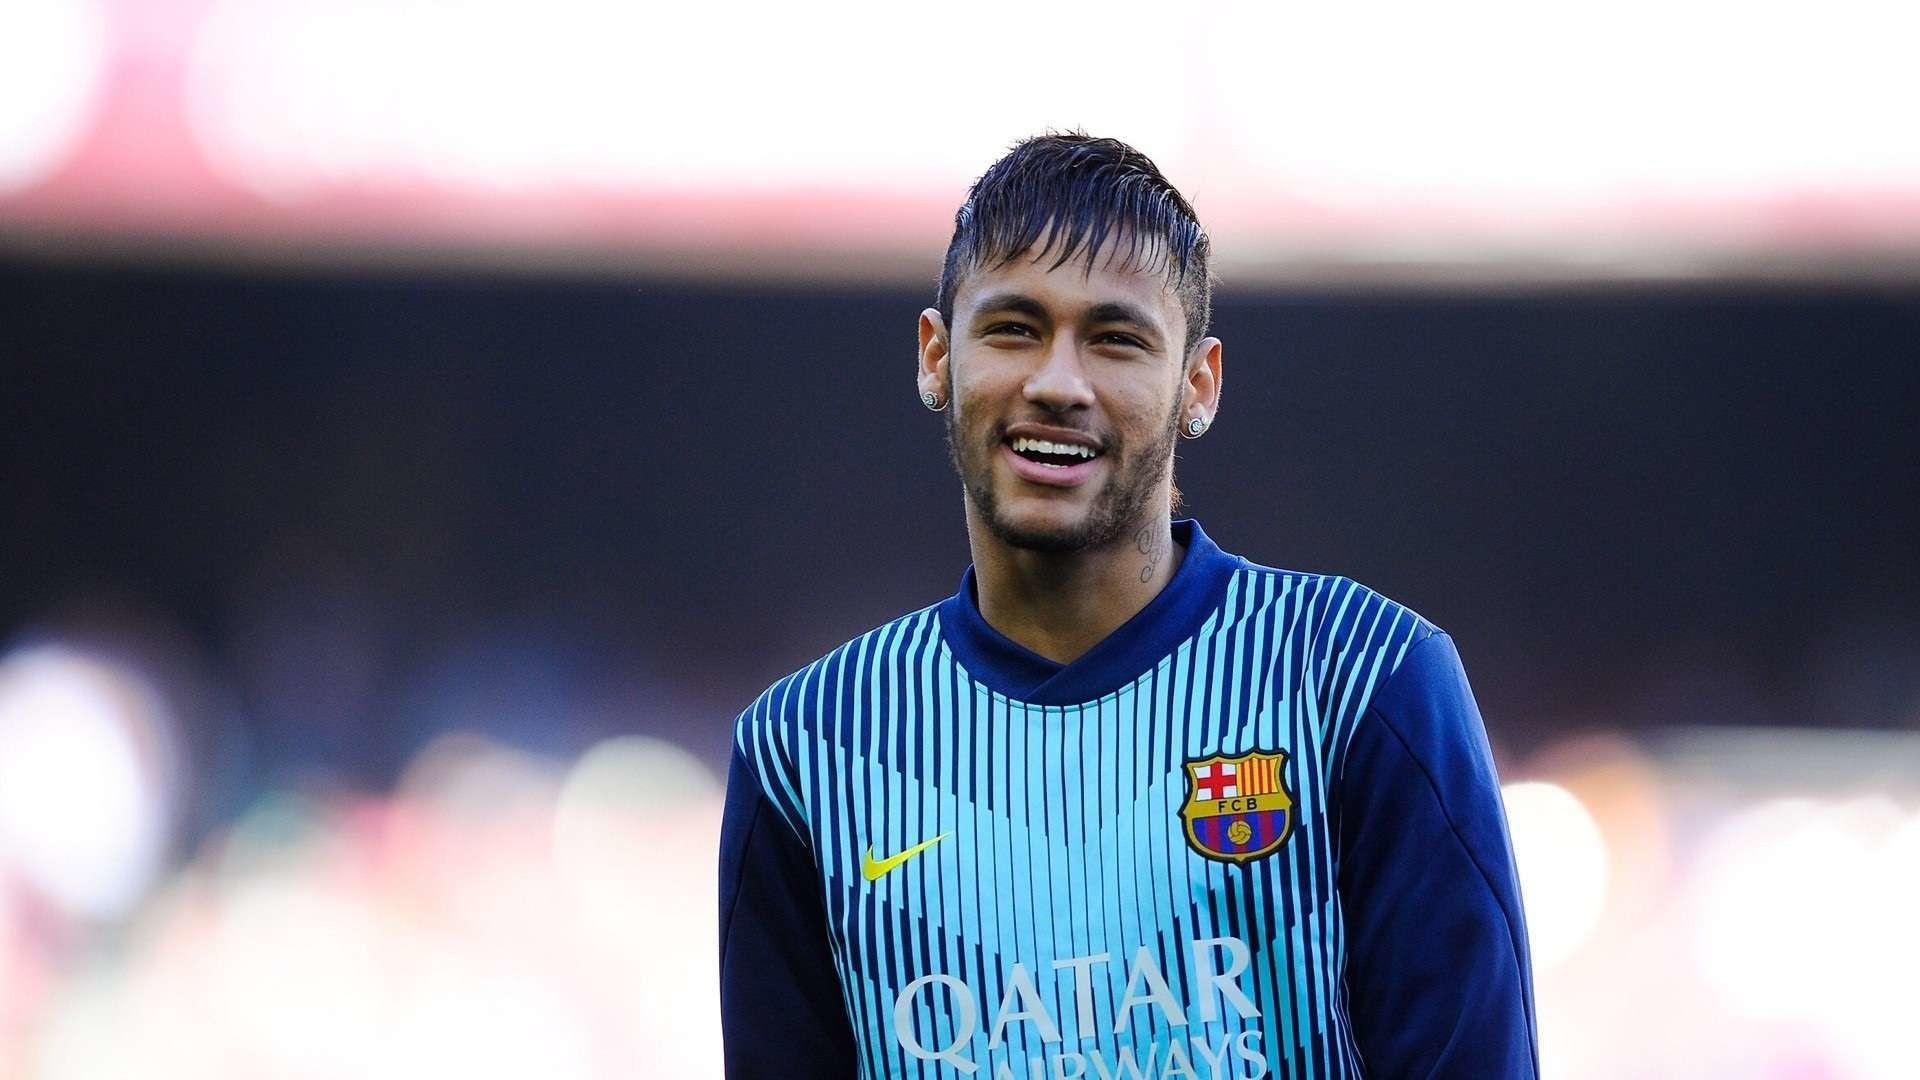 Neymar HD Wallpaper 2018 (79+ images)